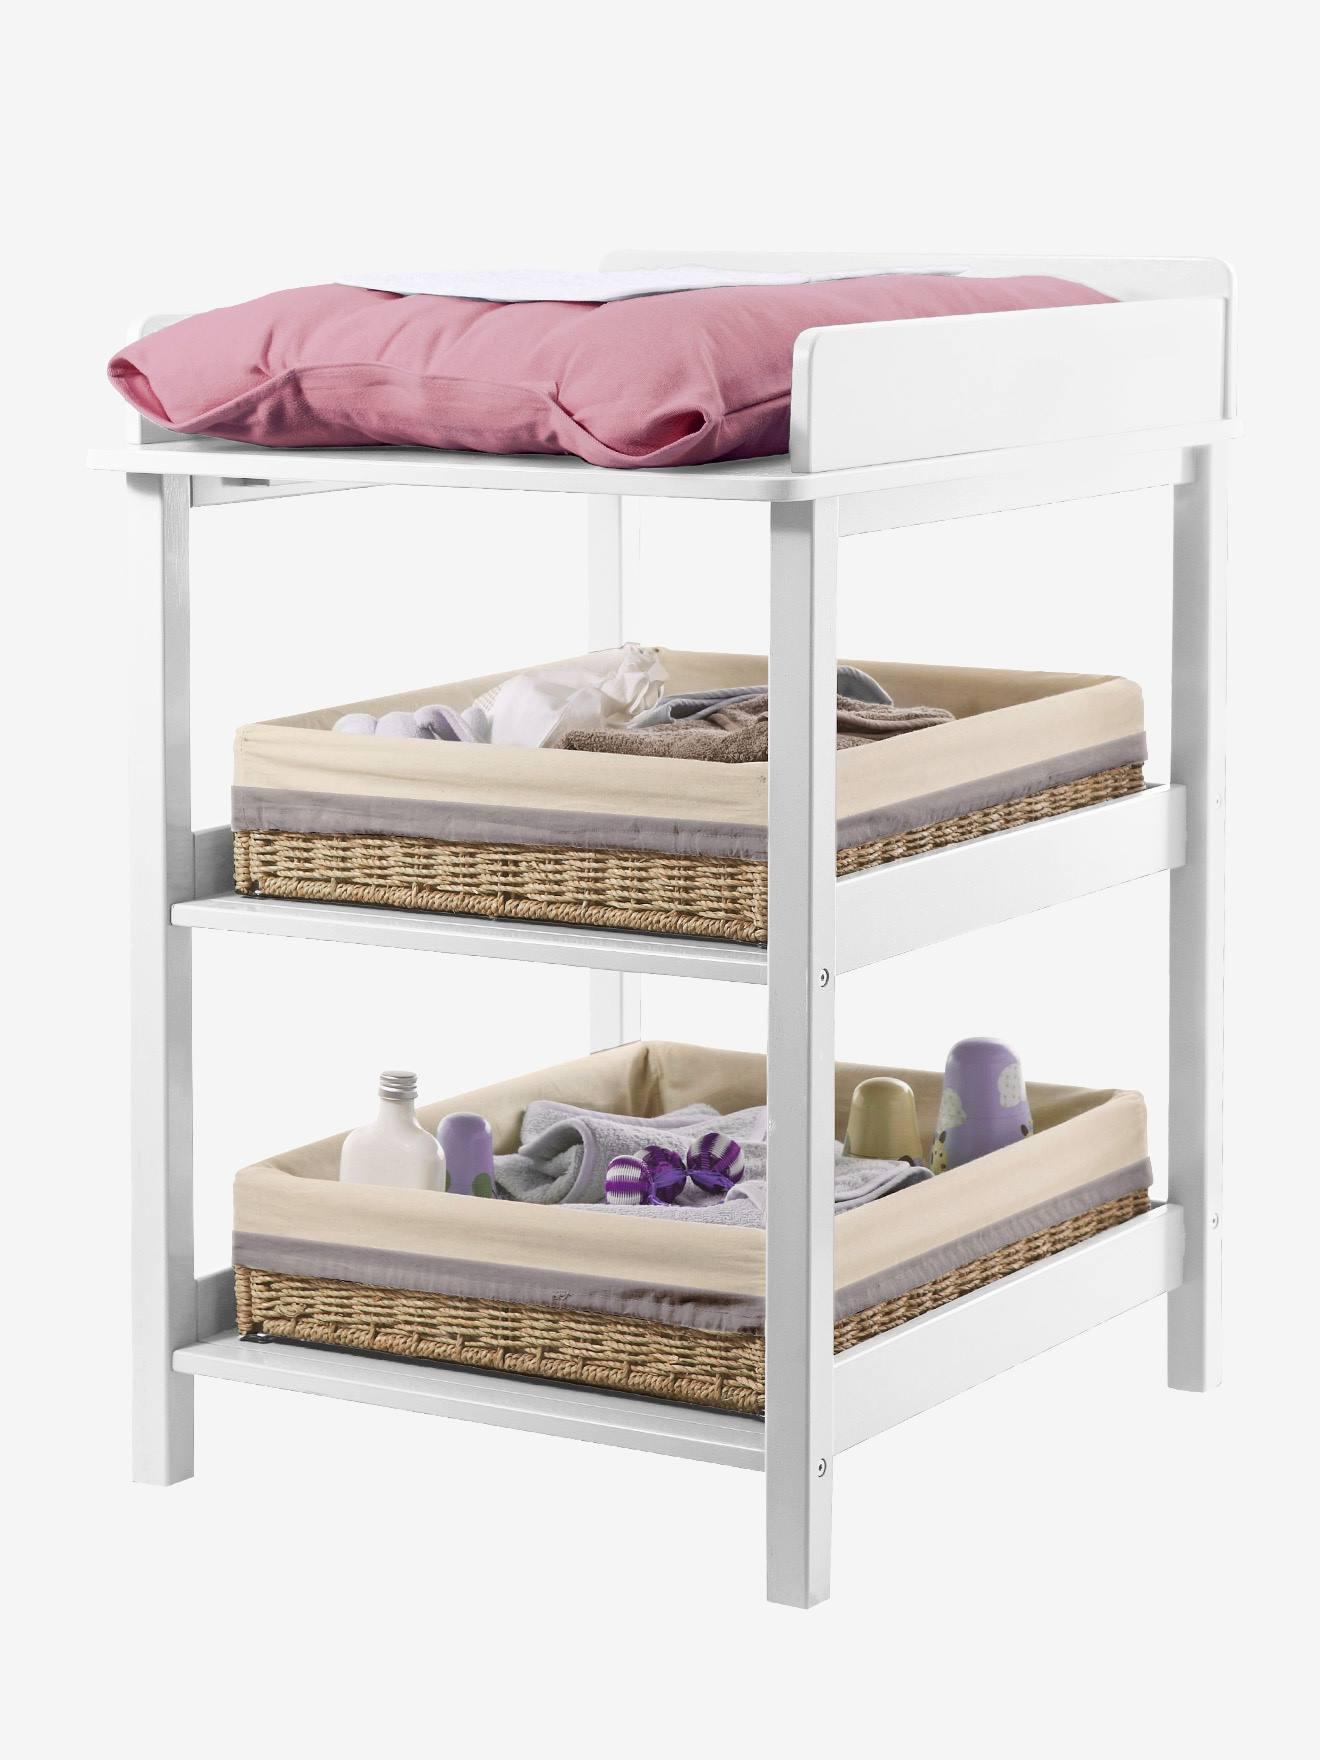 meubles et linge de table langertable with vert baudet meuble. Black Bedroom Furniture Sets. Home Design Ideas